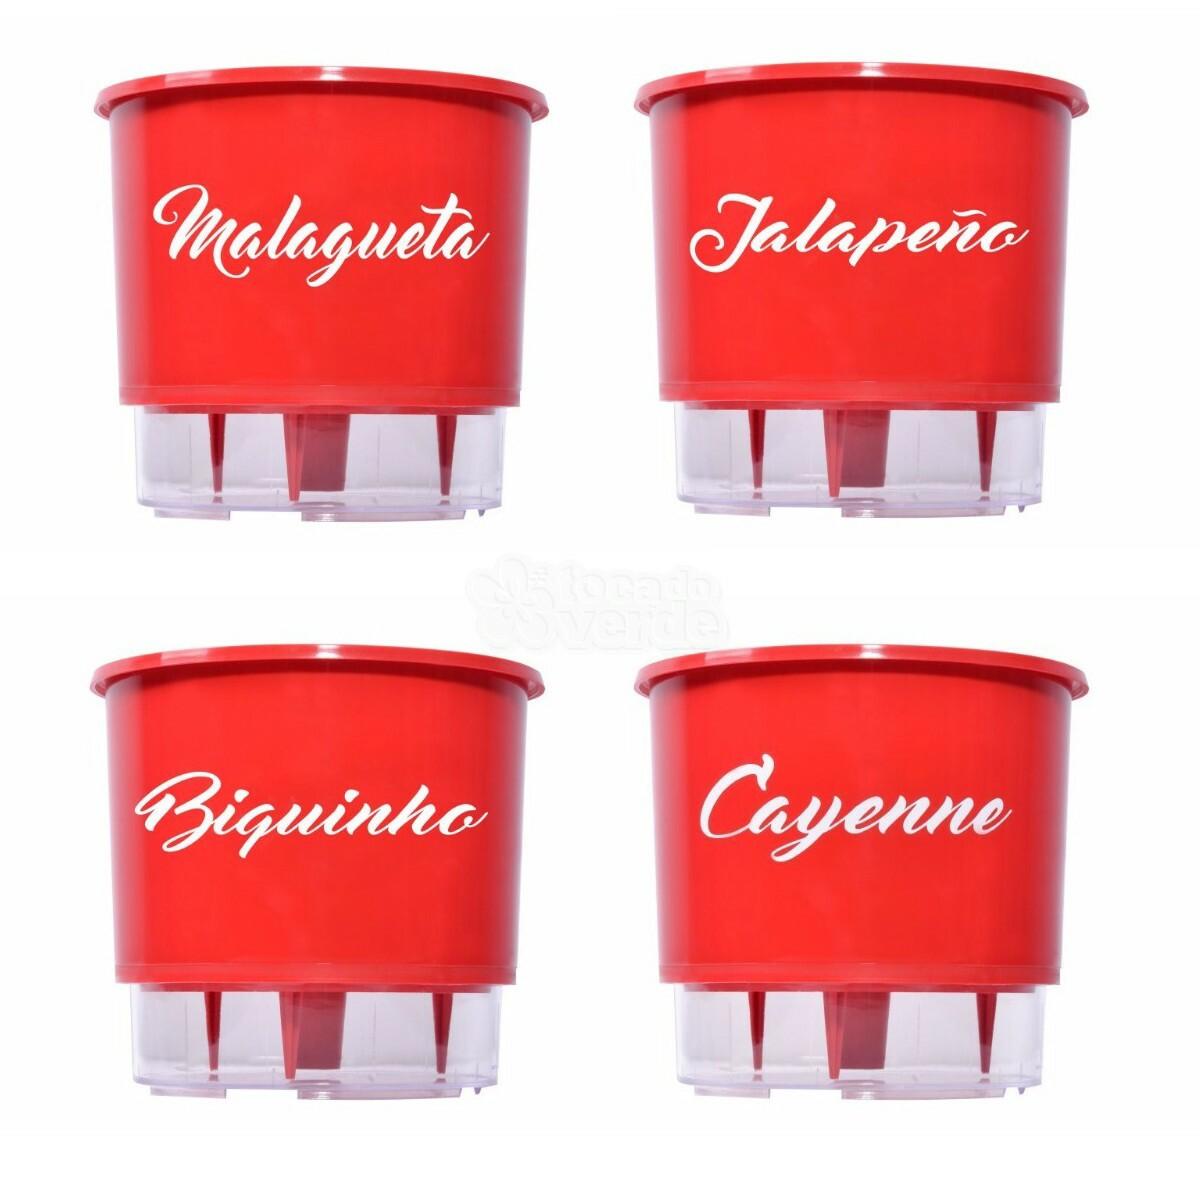 Linha Pimentas - Vasos Autoirrigáveis Médio T3 - Vermelho